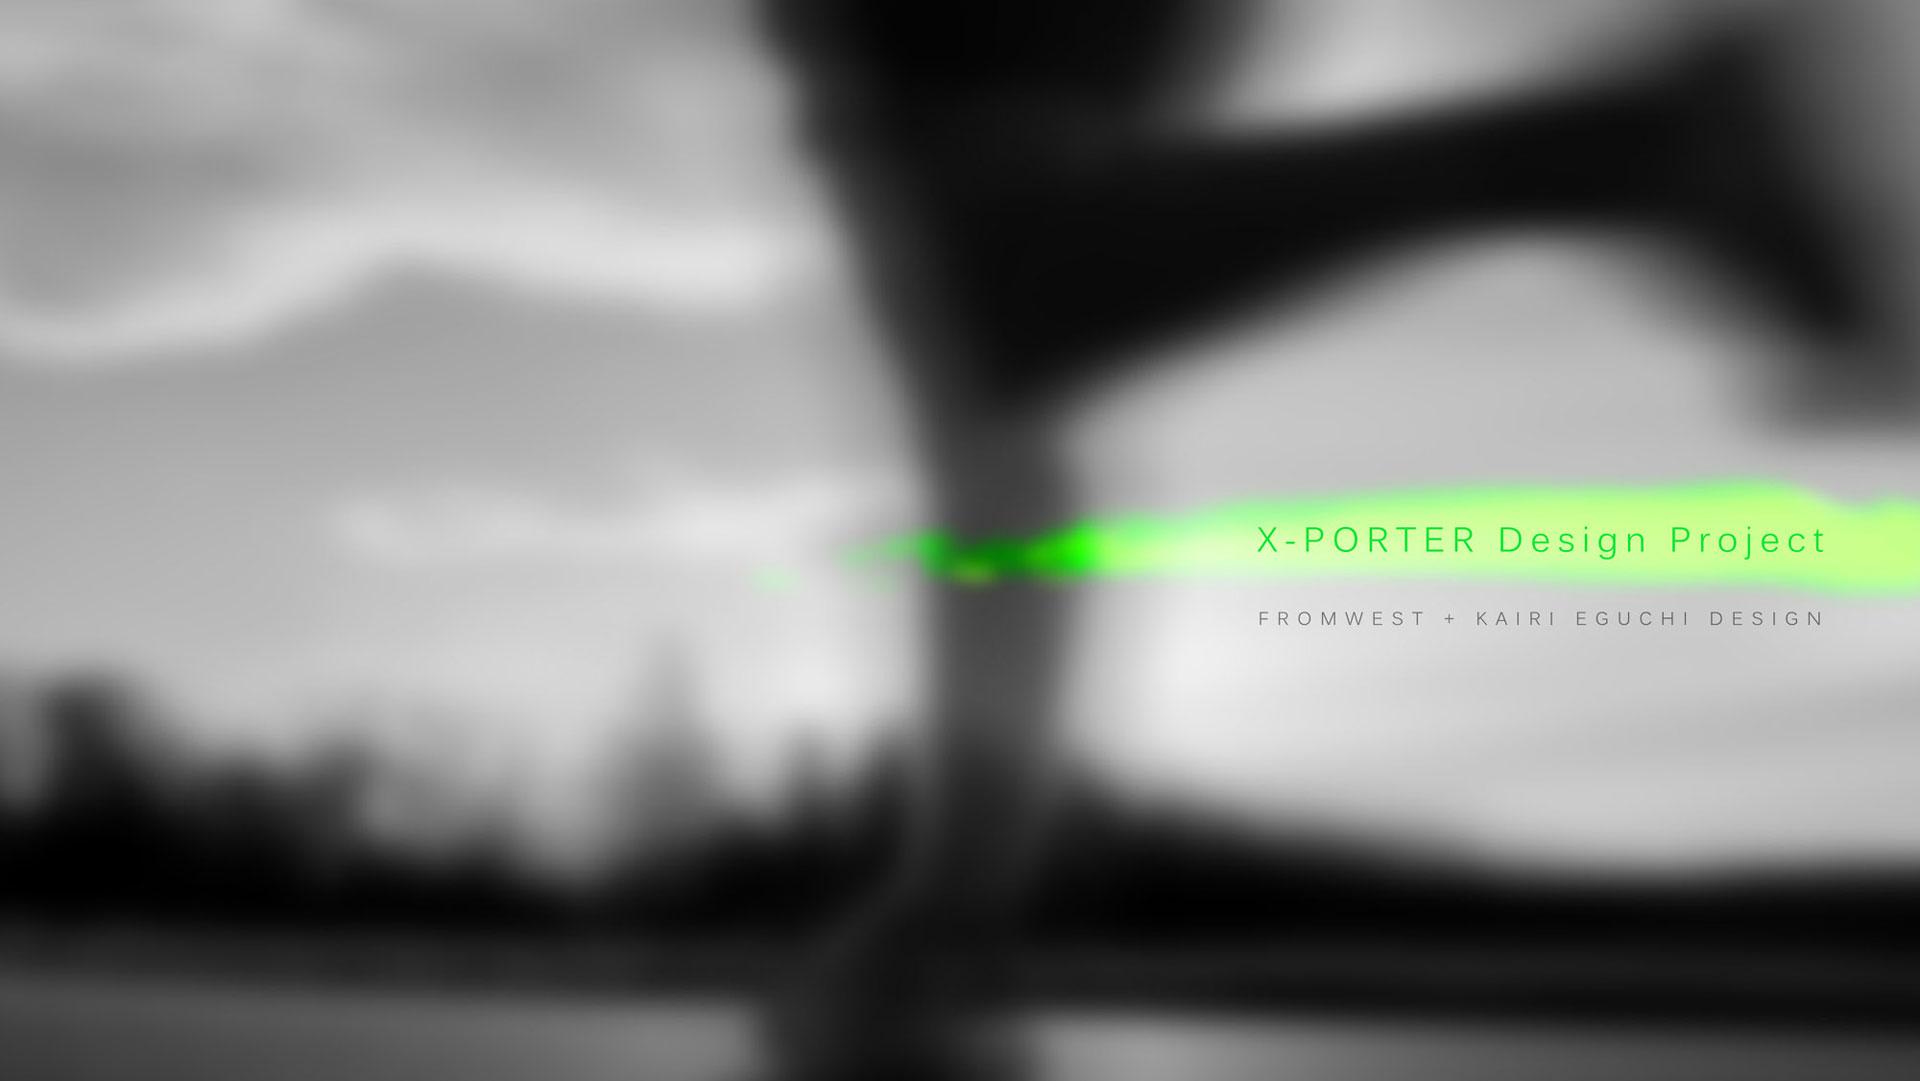 xporter_001.jpg